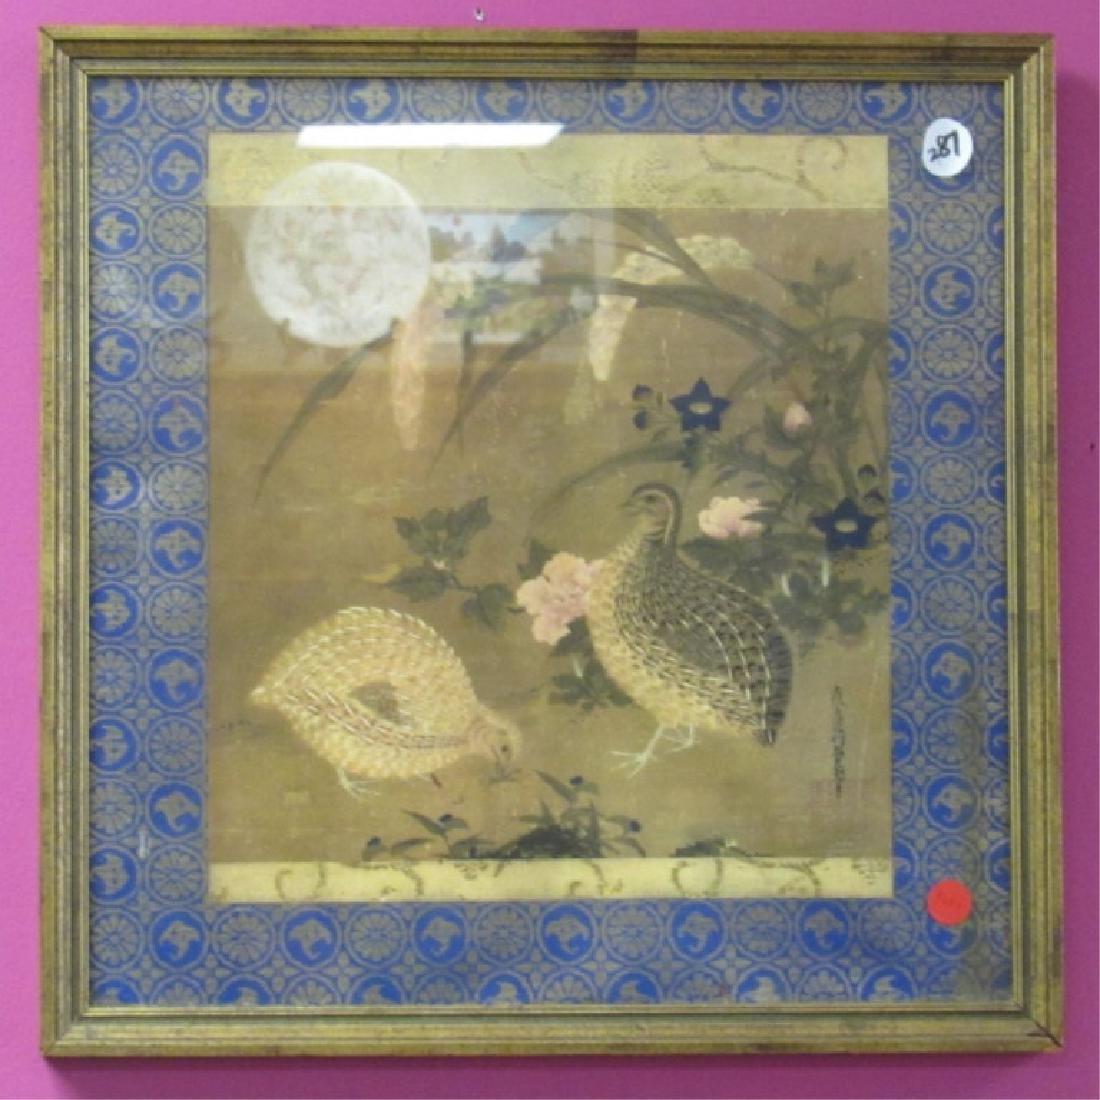 17th Century Japanese Painting Print